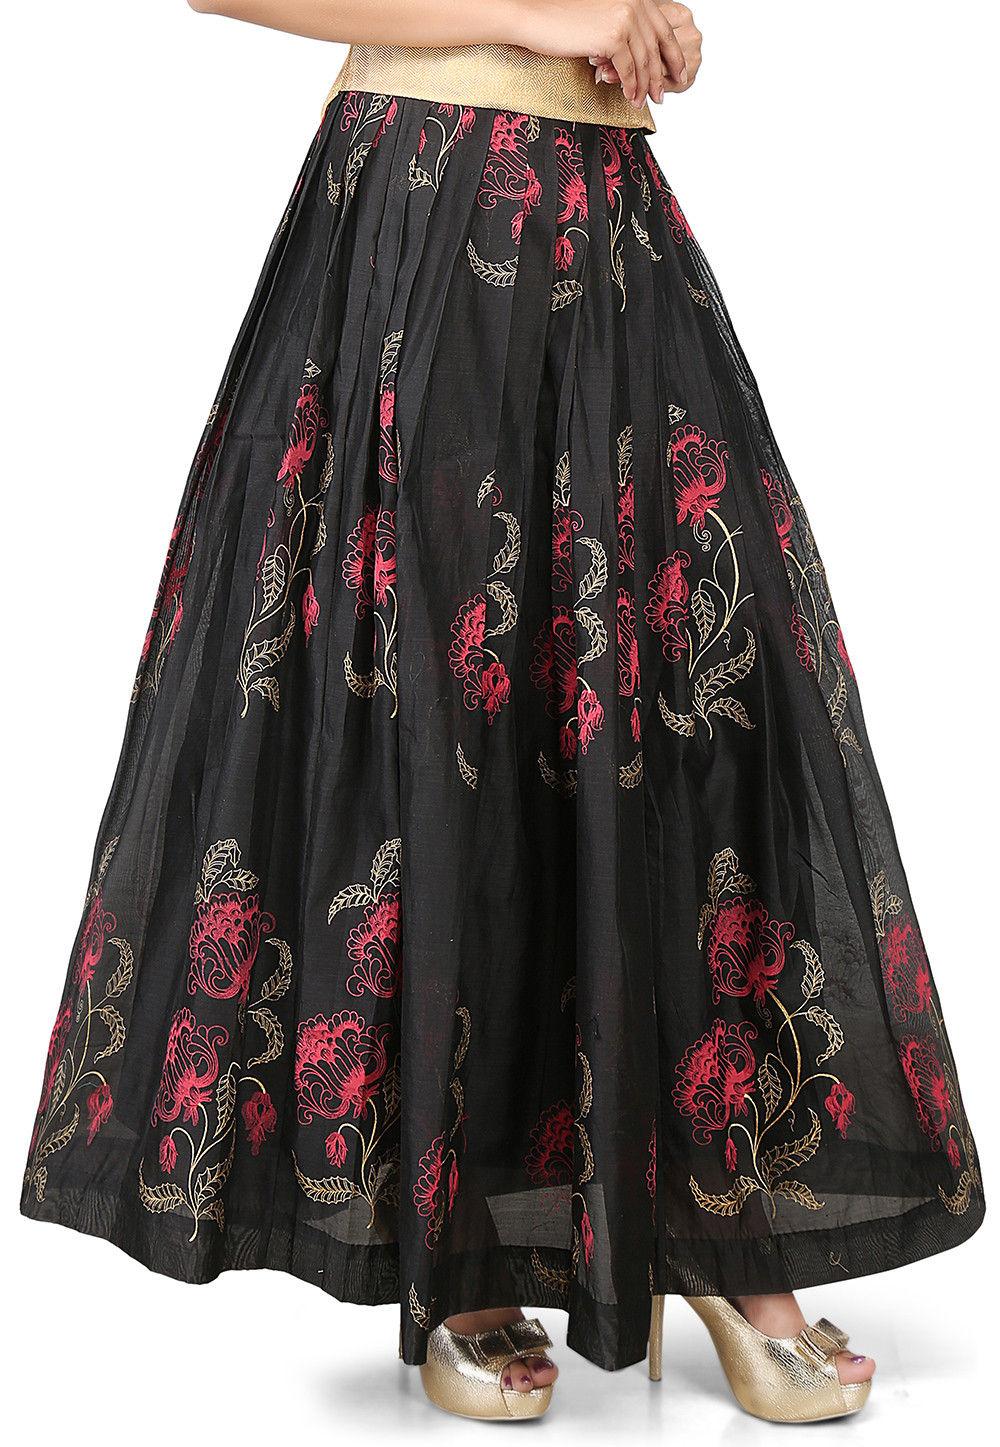 888f64a5b1e1 ... Printed Chanderi Silk Long Skirt in Black. Zoom